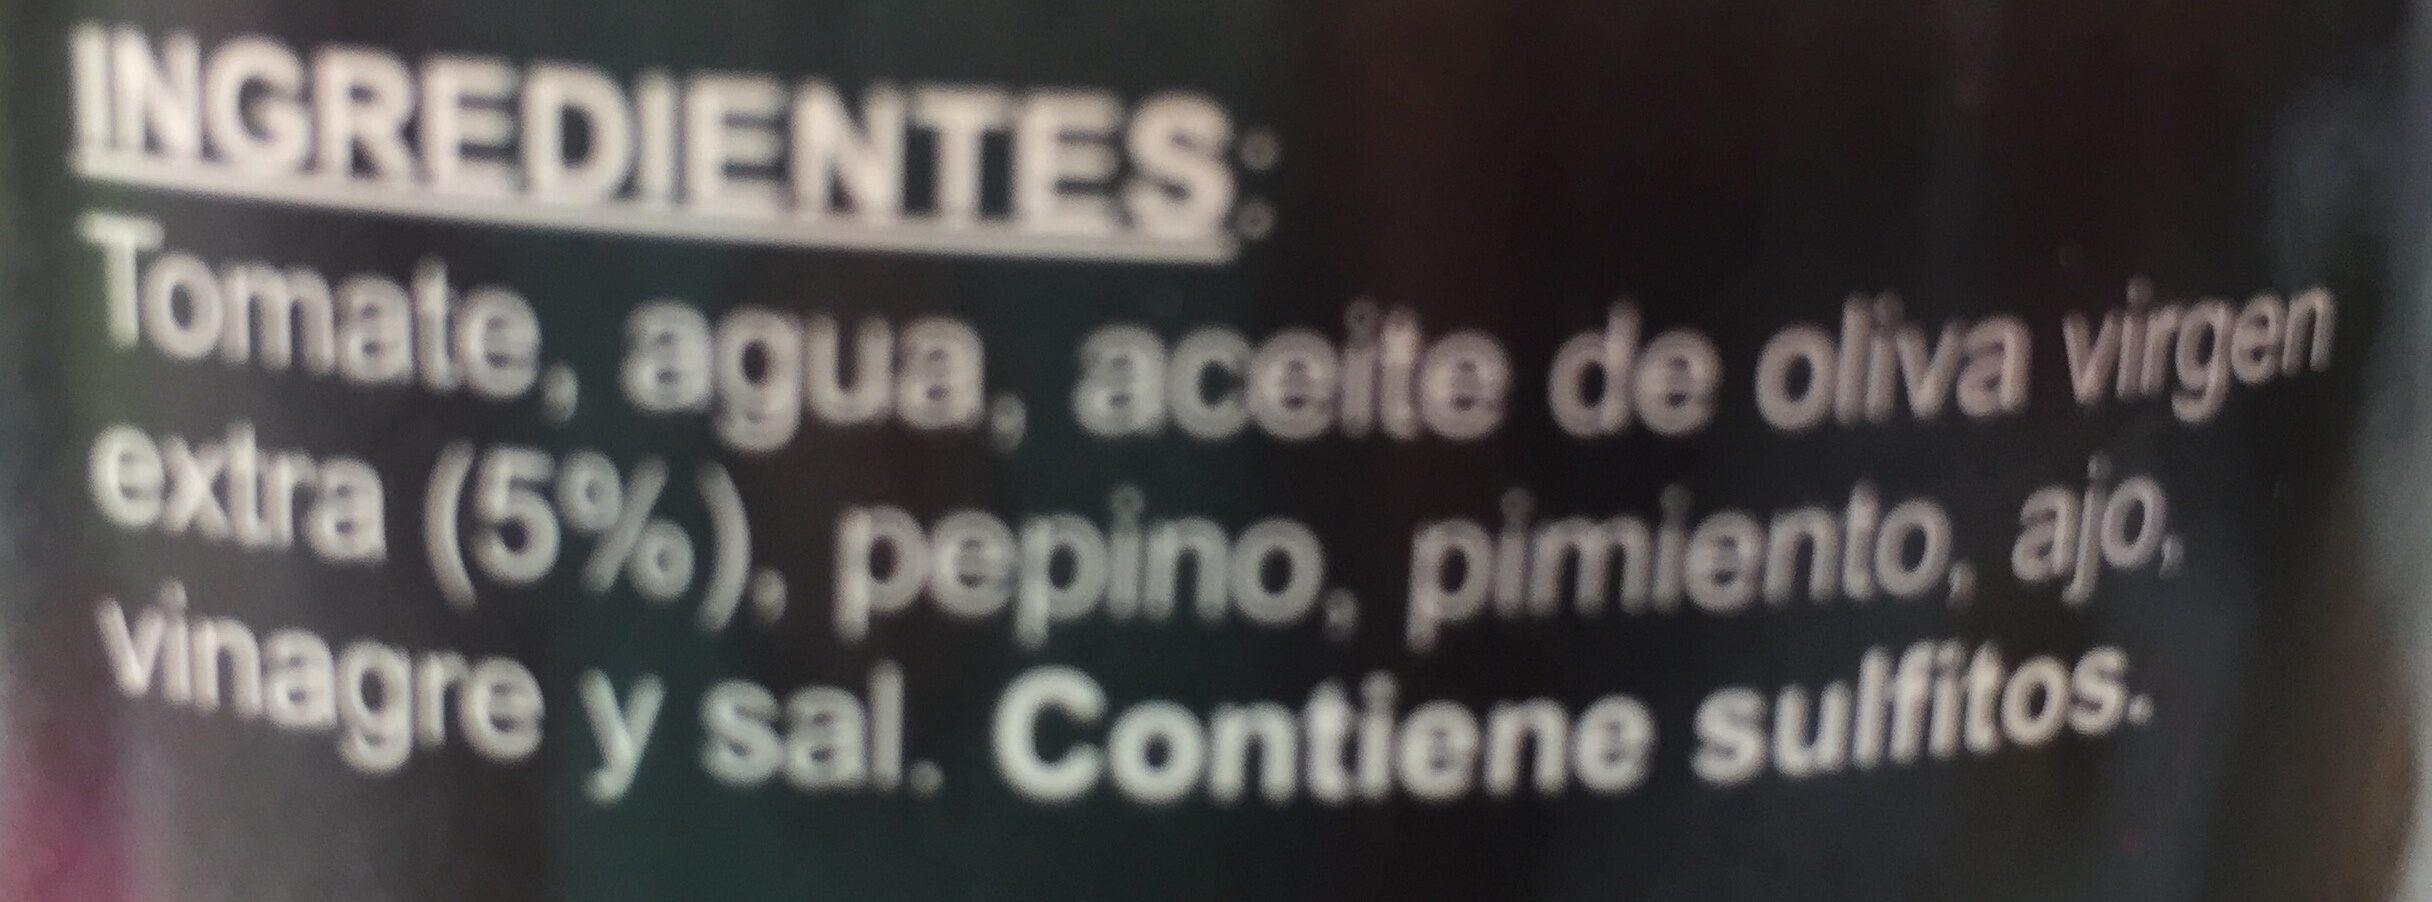 Gazpacho Fresco - Ingredientes - es